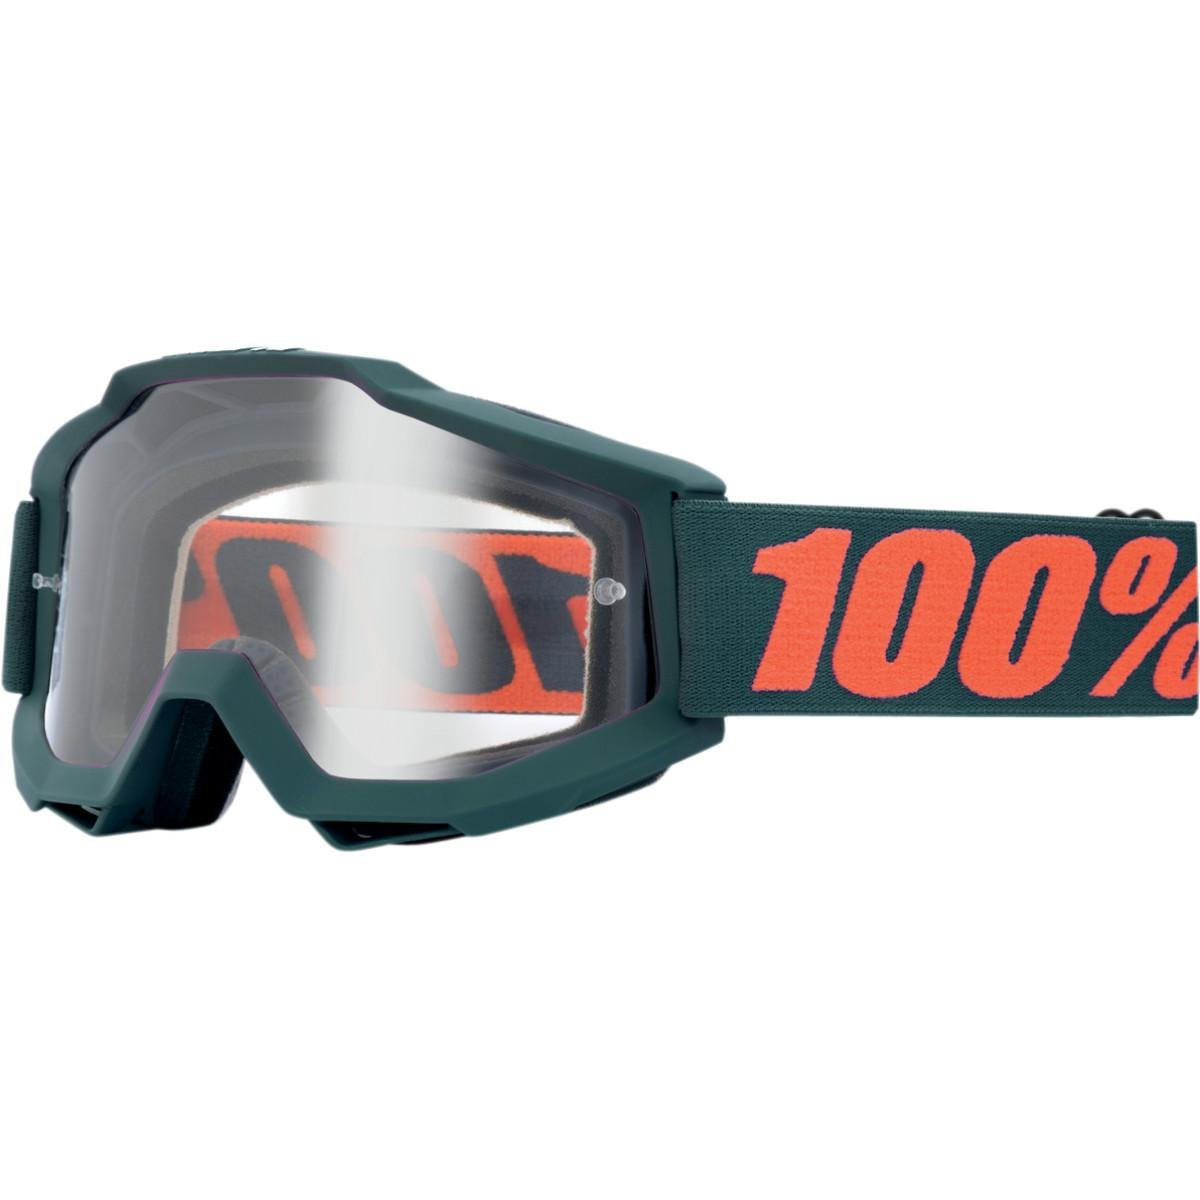 100% Crossbrille The Accuri Grau 50200-025-02